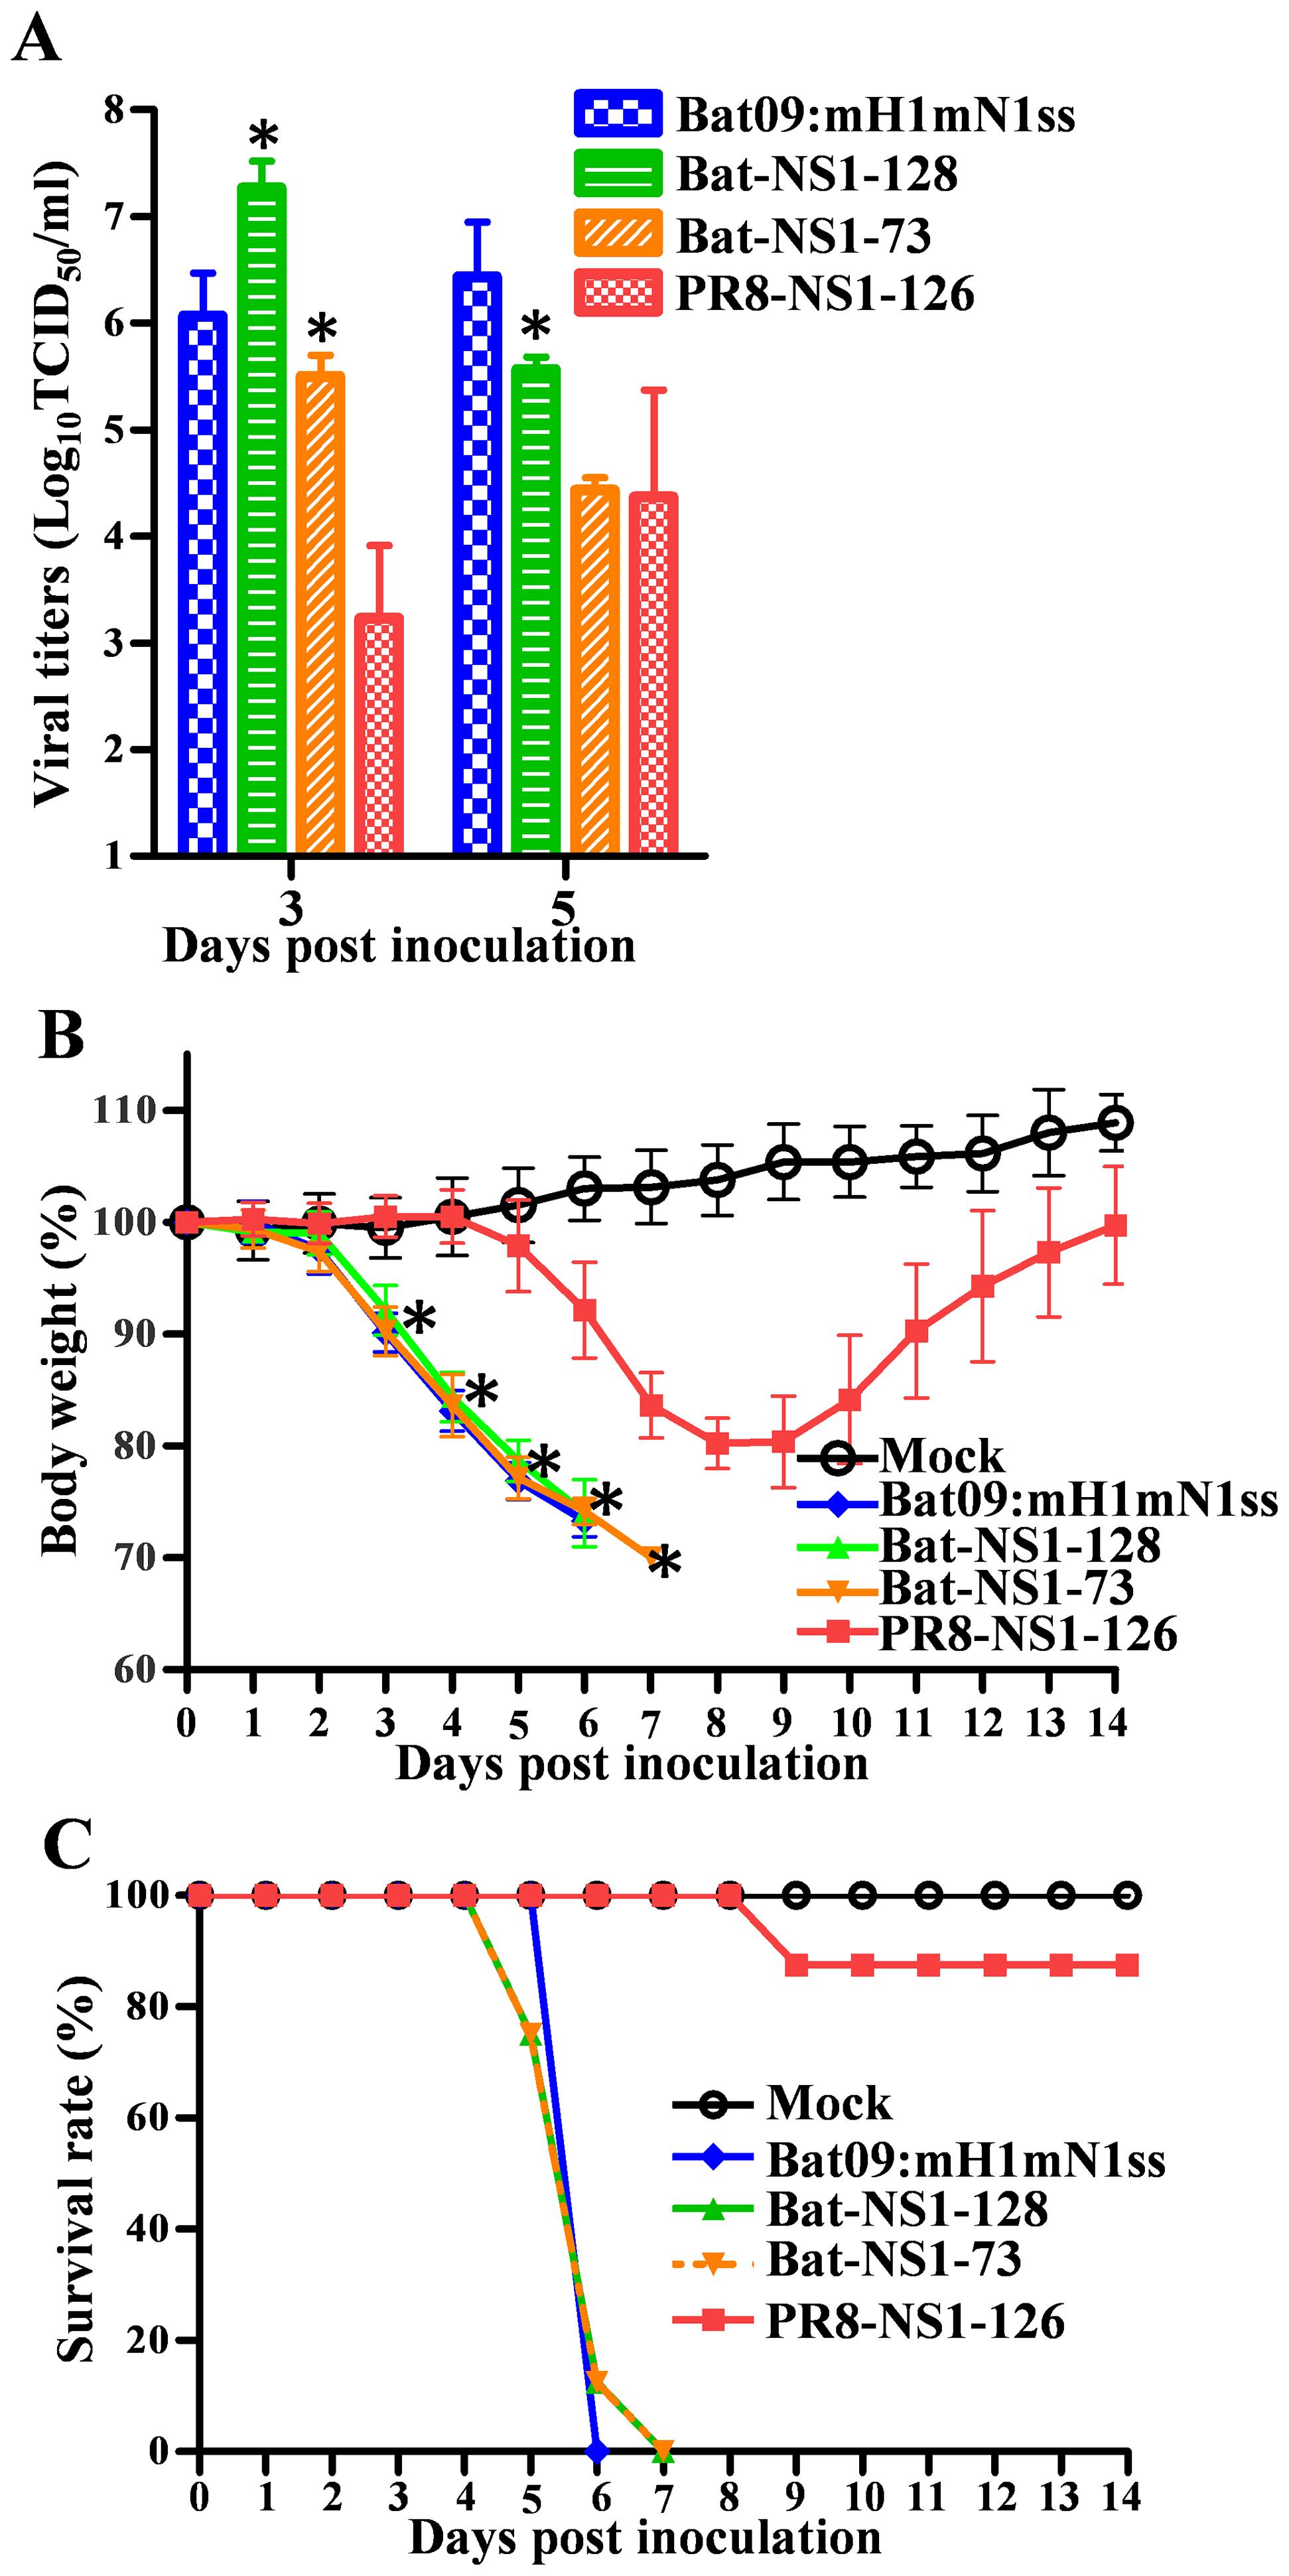 Pathogenicity of Bat-NS1 mutants in mice.